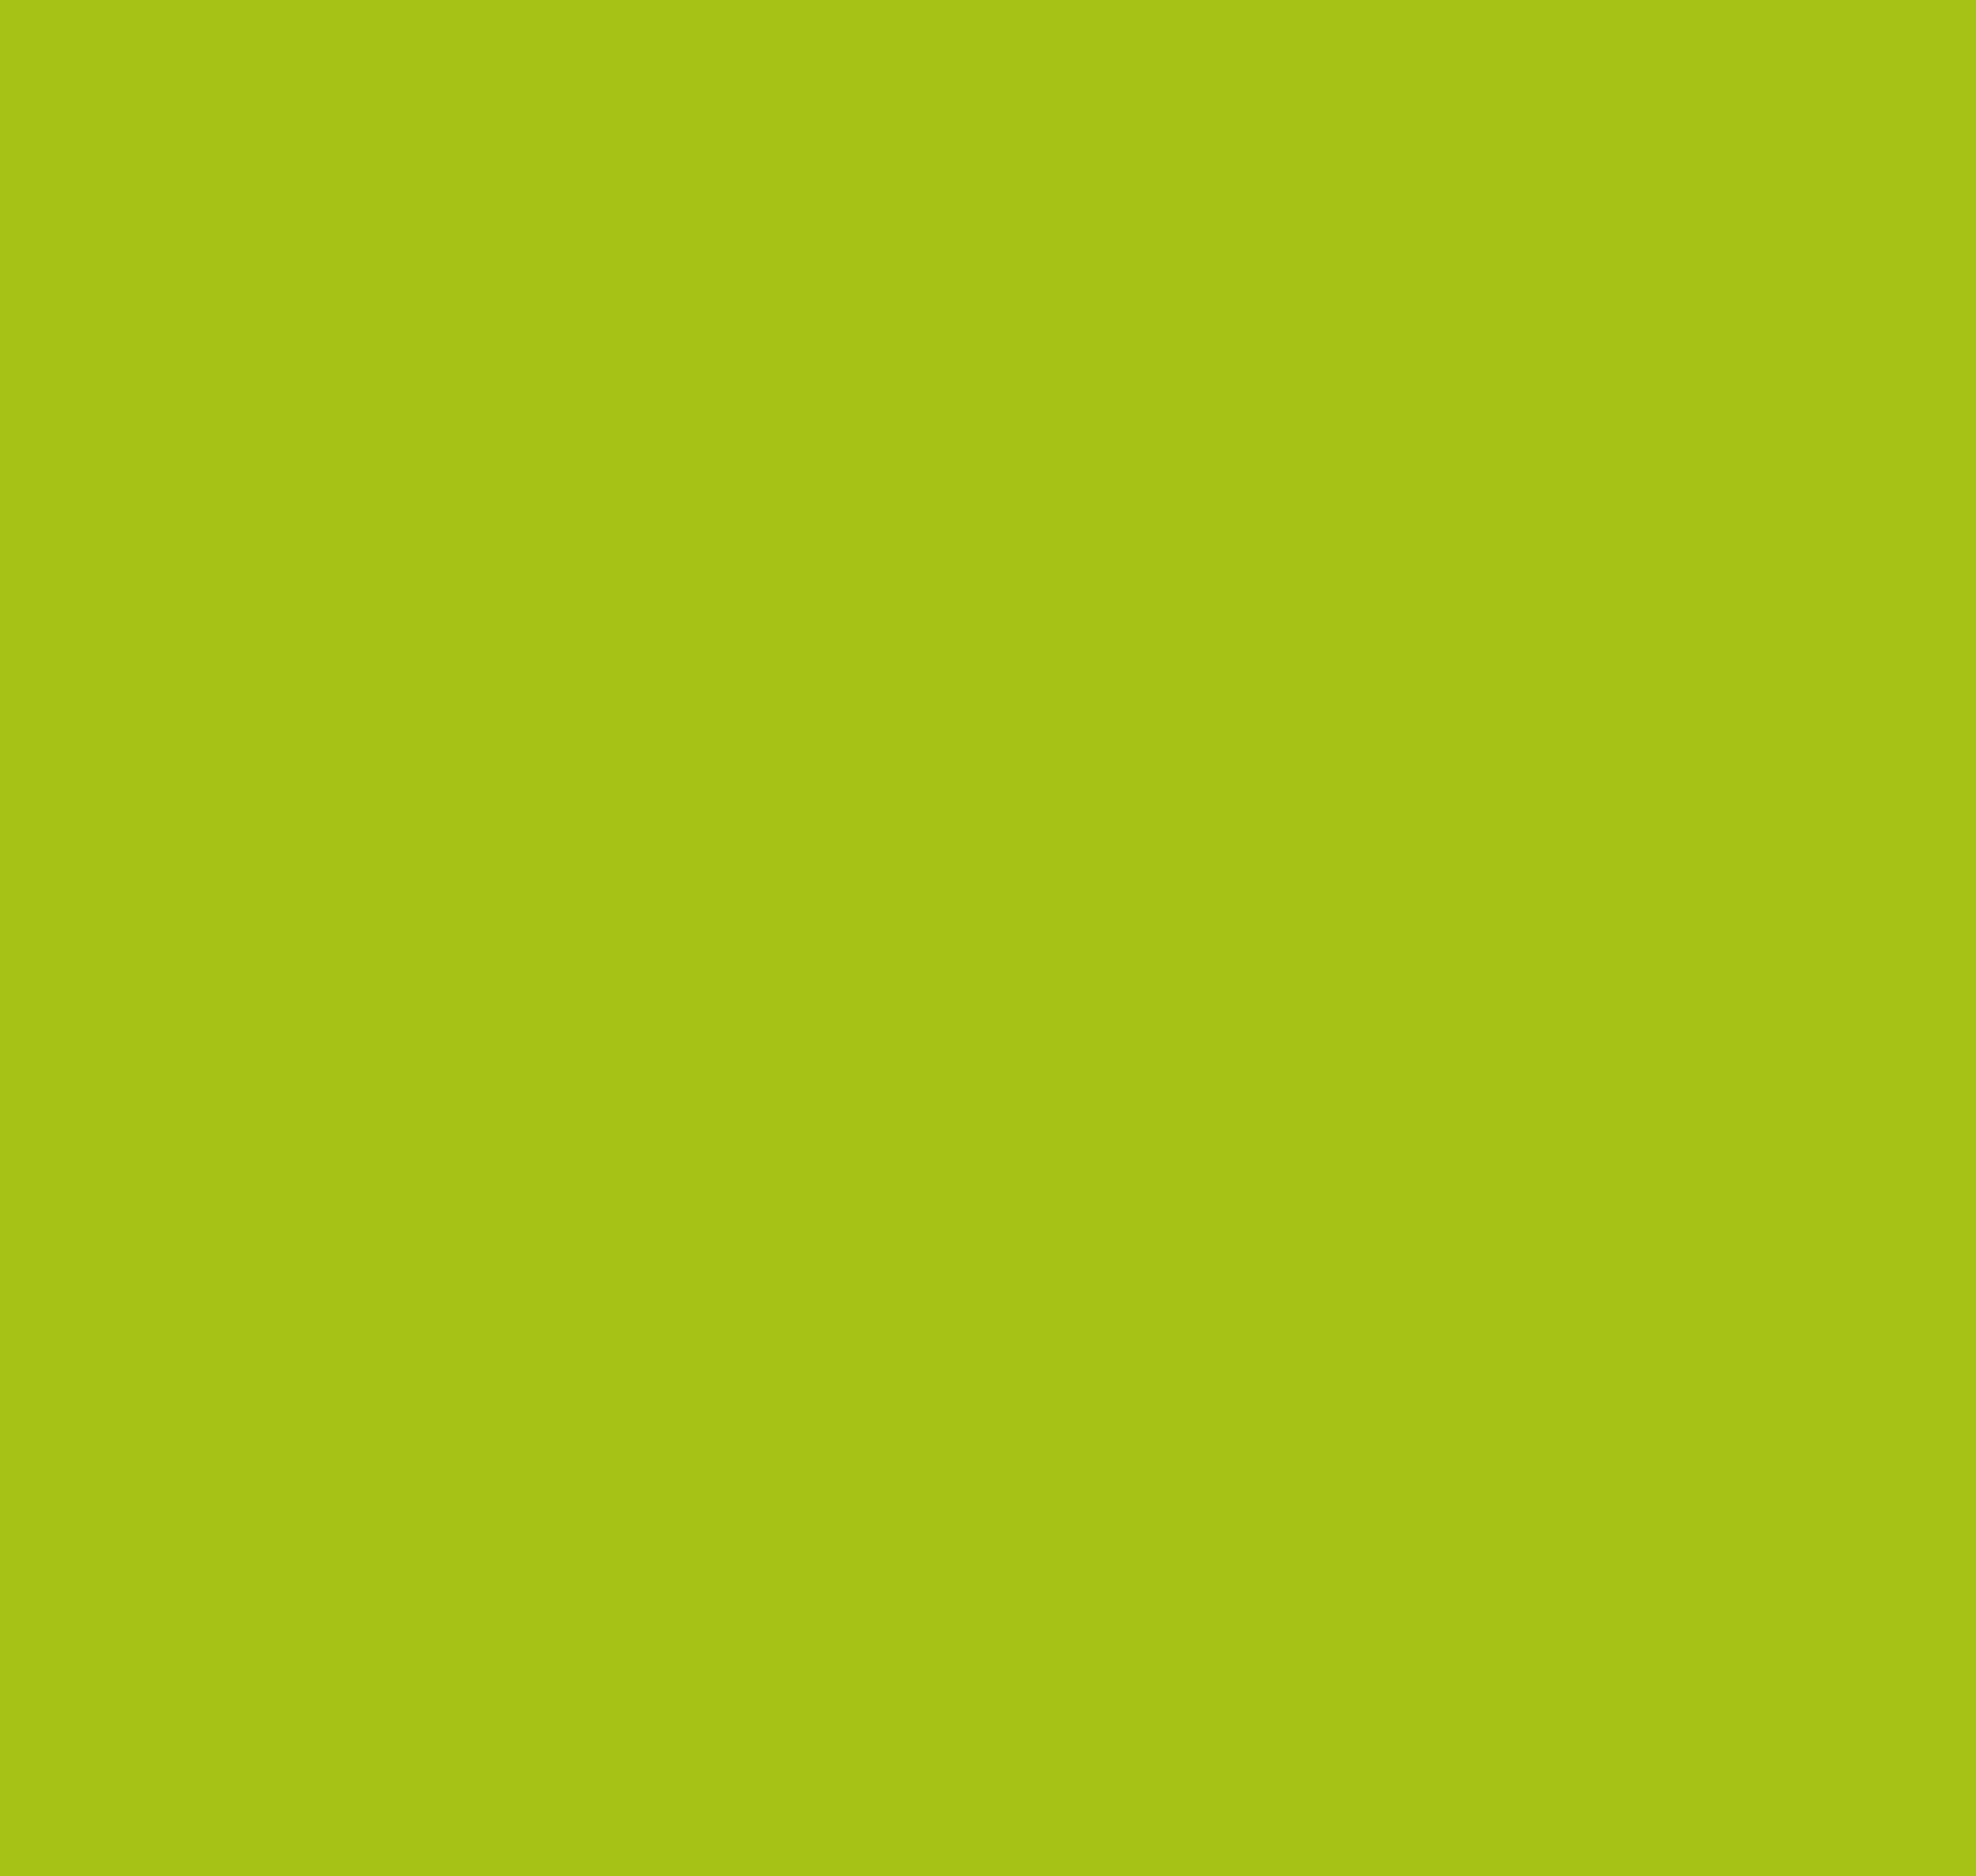 elektro_mobilität_grün